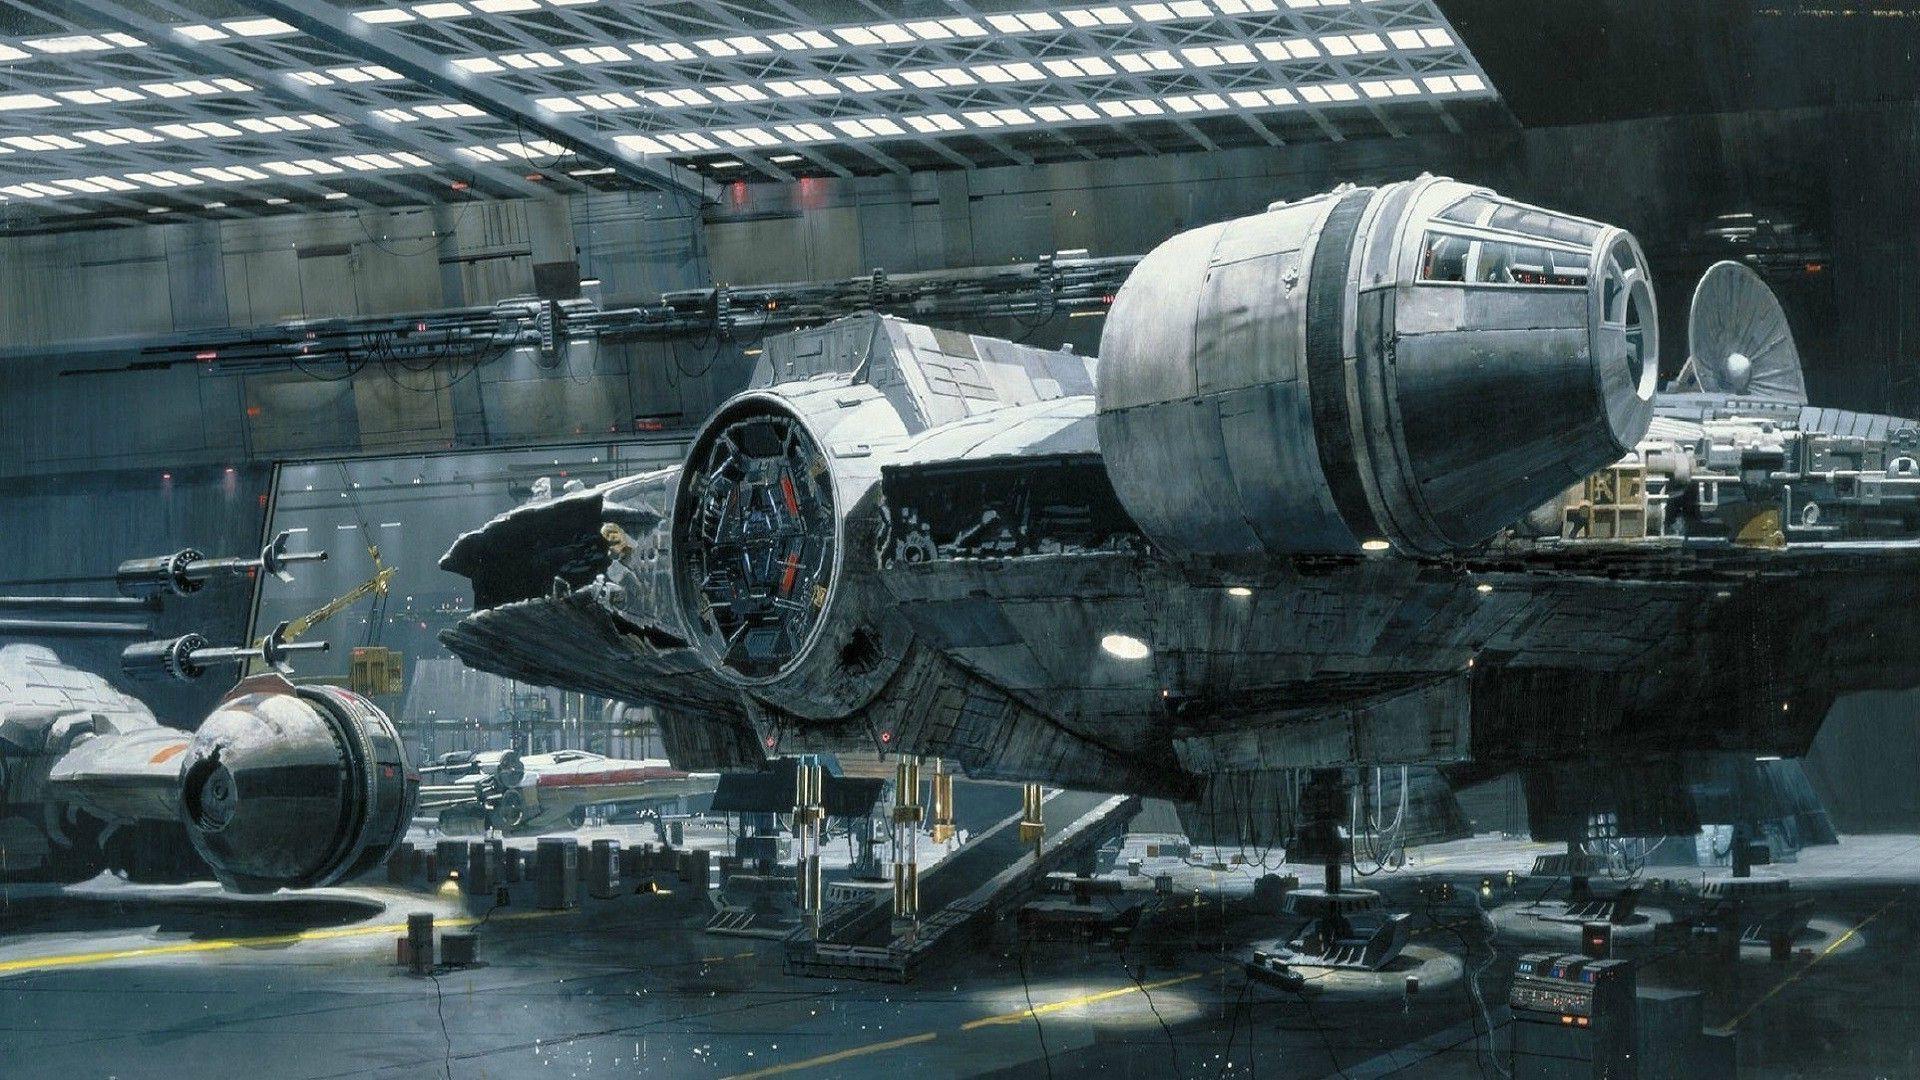 Wallpaper Star Wars Airplane Spaceship Machine Millennium Falcon Hangar Aviation Industry 1920x1080 Px Spacecraft Aircraft Engine Aerospace Engineering Jet Engine 1920x1080 787021 Hd Wallpapers Wallhere